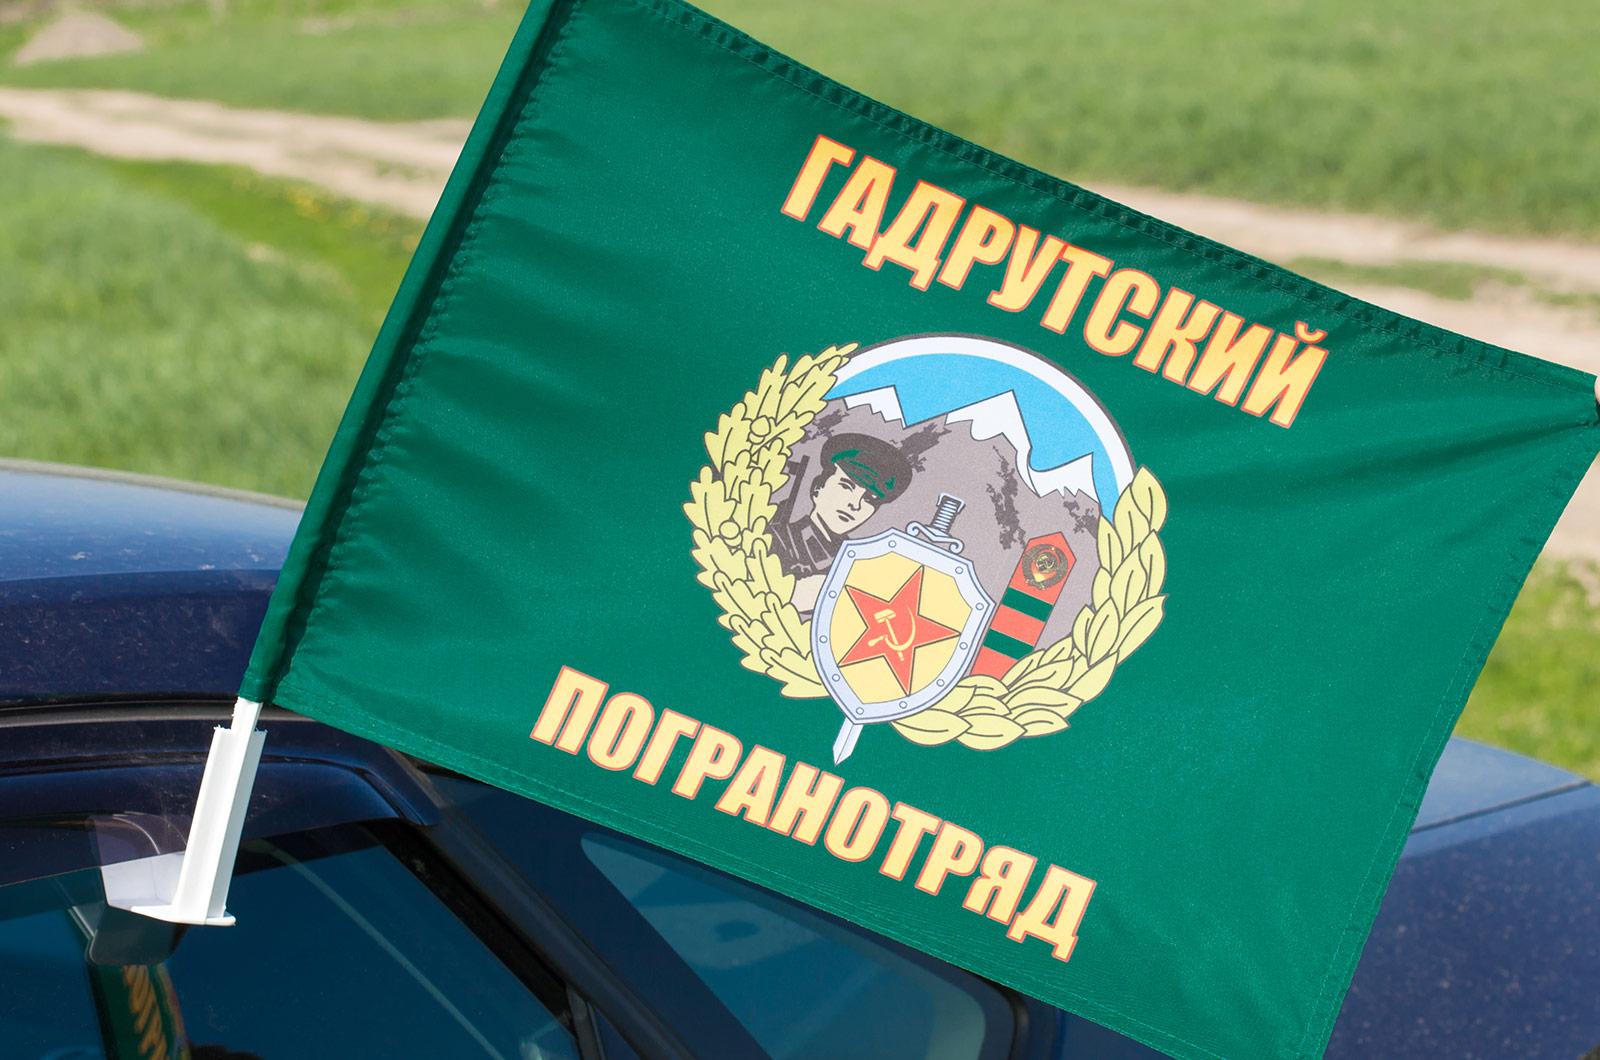 Двухсторонний флаг «Гадрутский пограничный отряд»